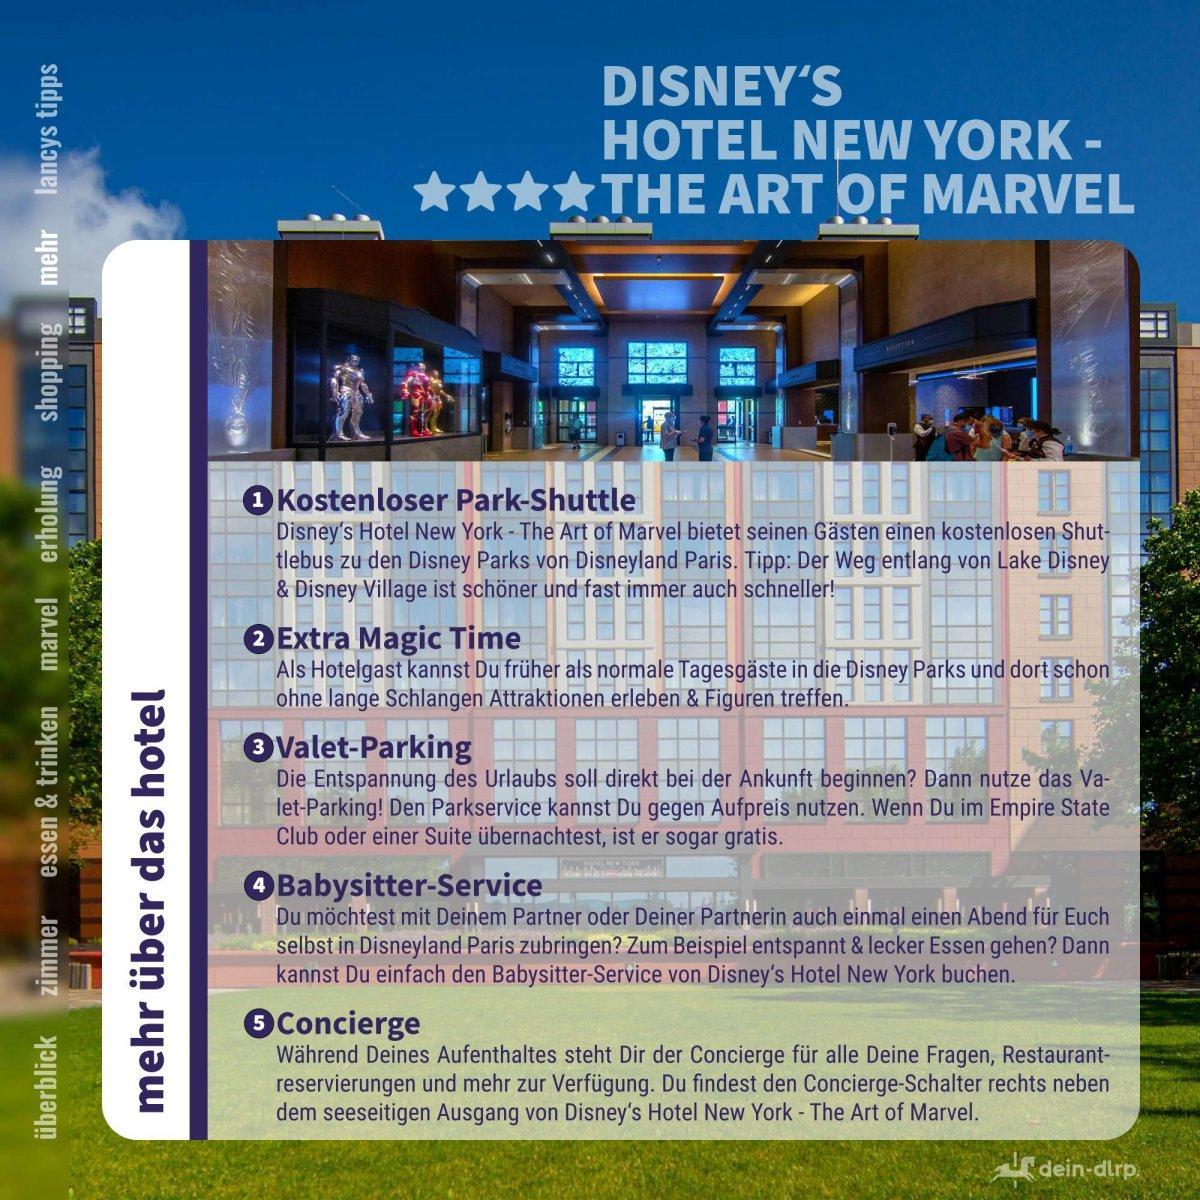 disneys-hotel-new-york-the-art-of-hotel-fuehrer_08.jpg